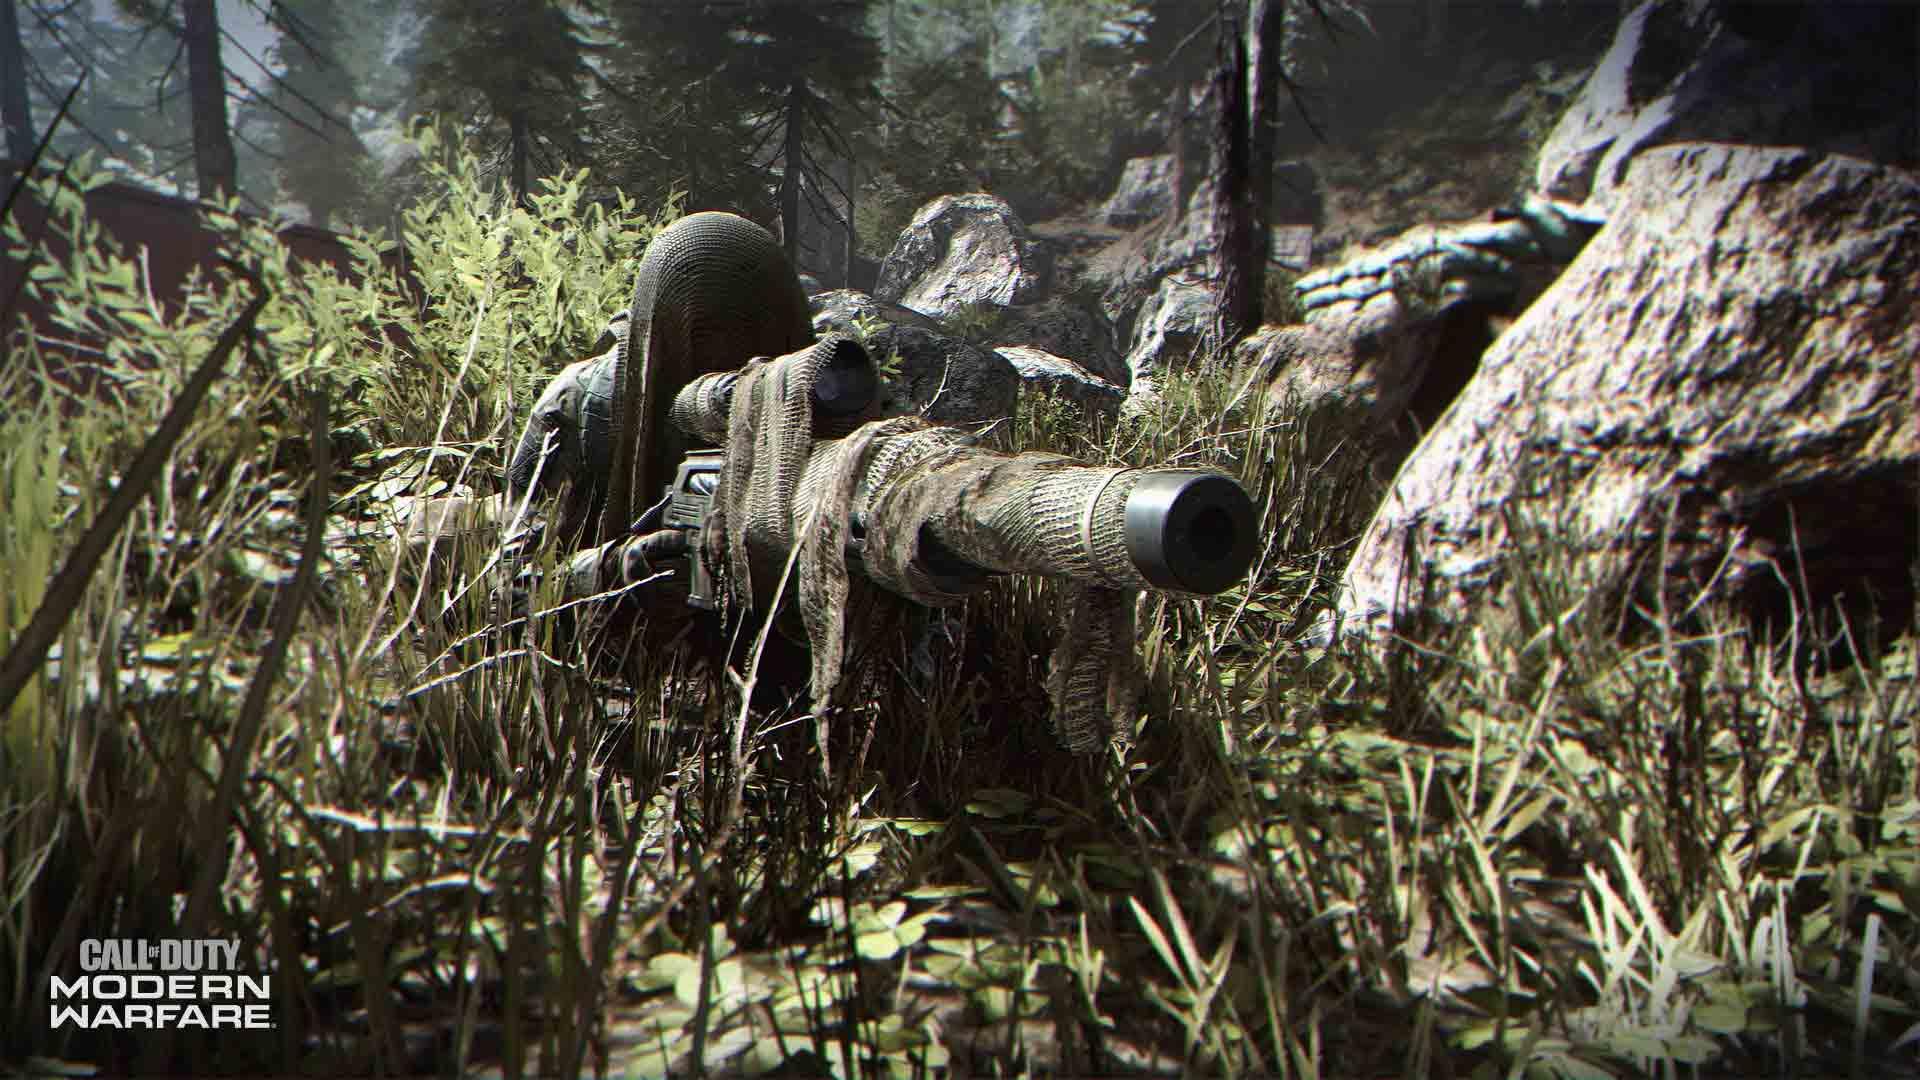 Call Of Duty Modern Warfare Remastered Wallpaper 68503 1920x1080px